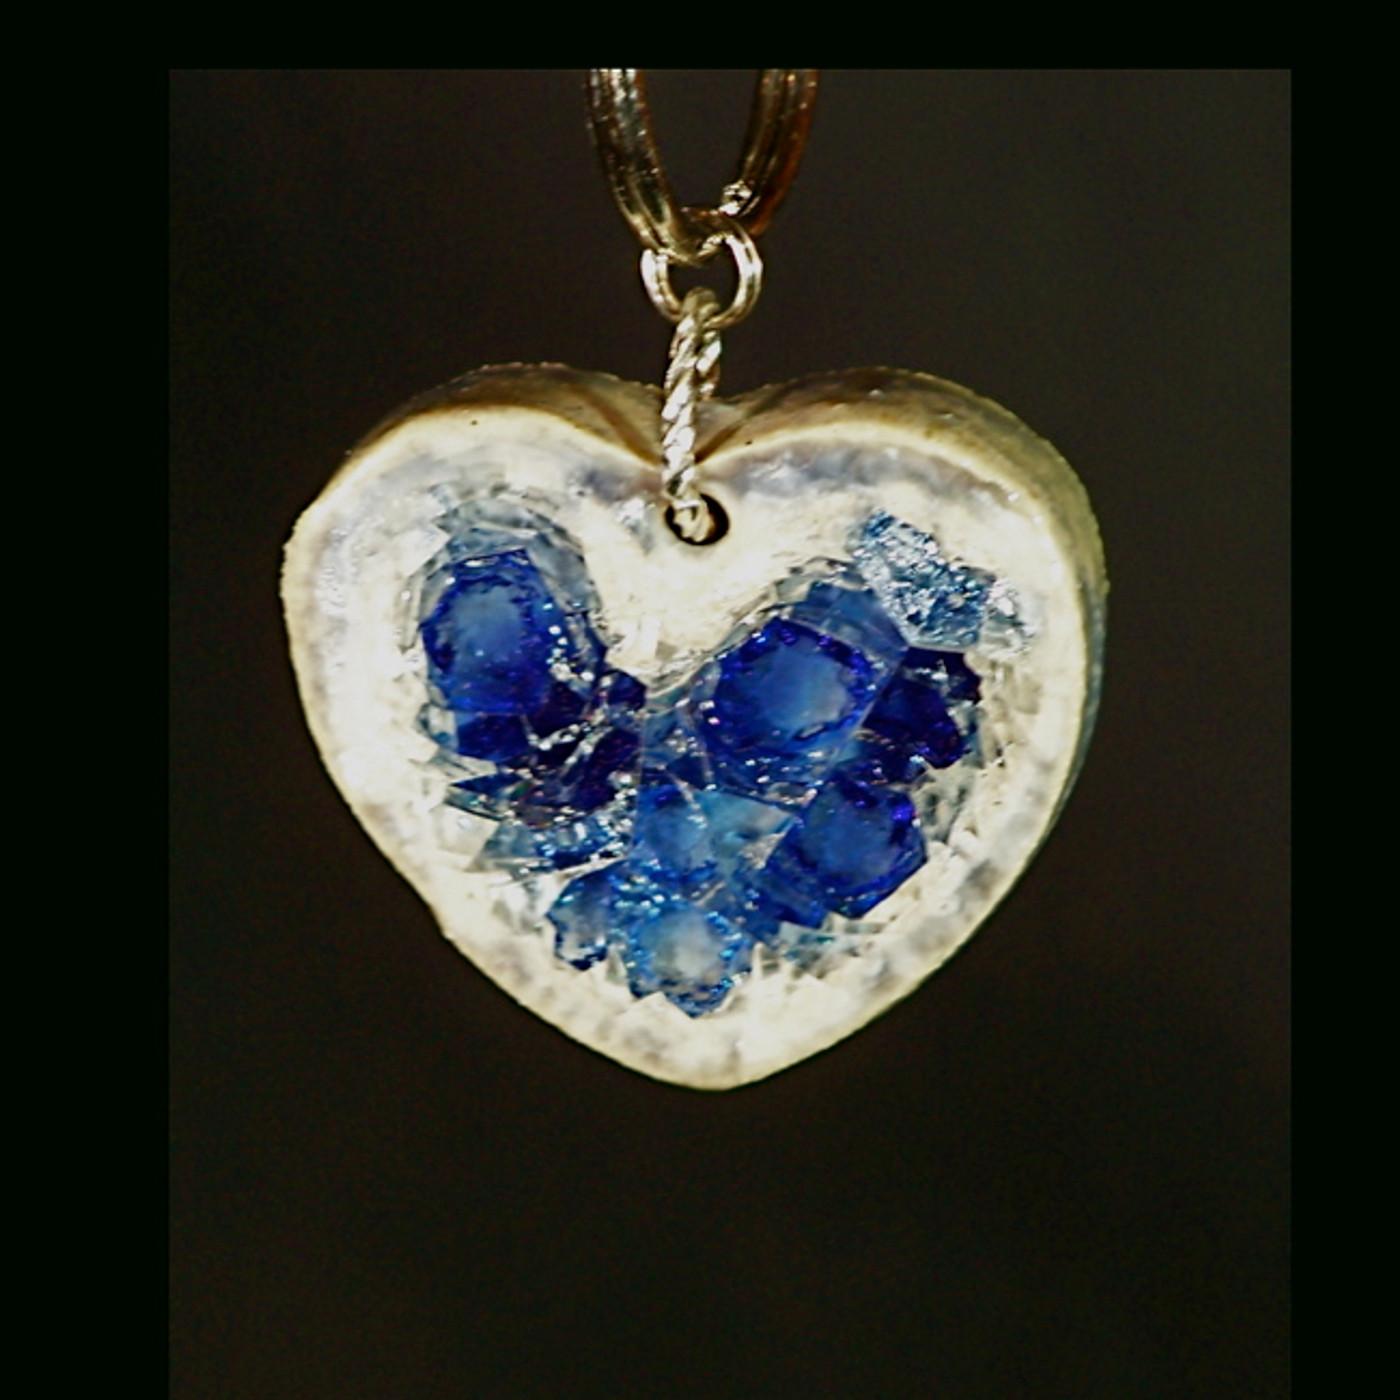 Heart Shape Keychain